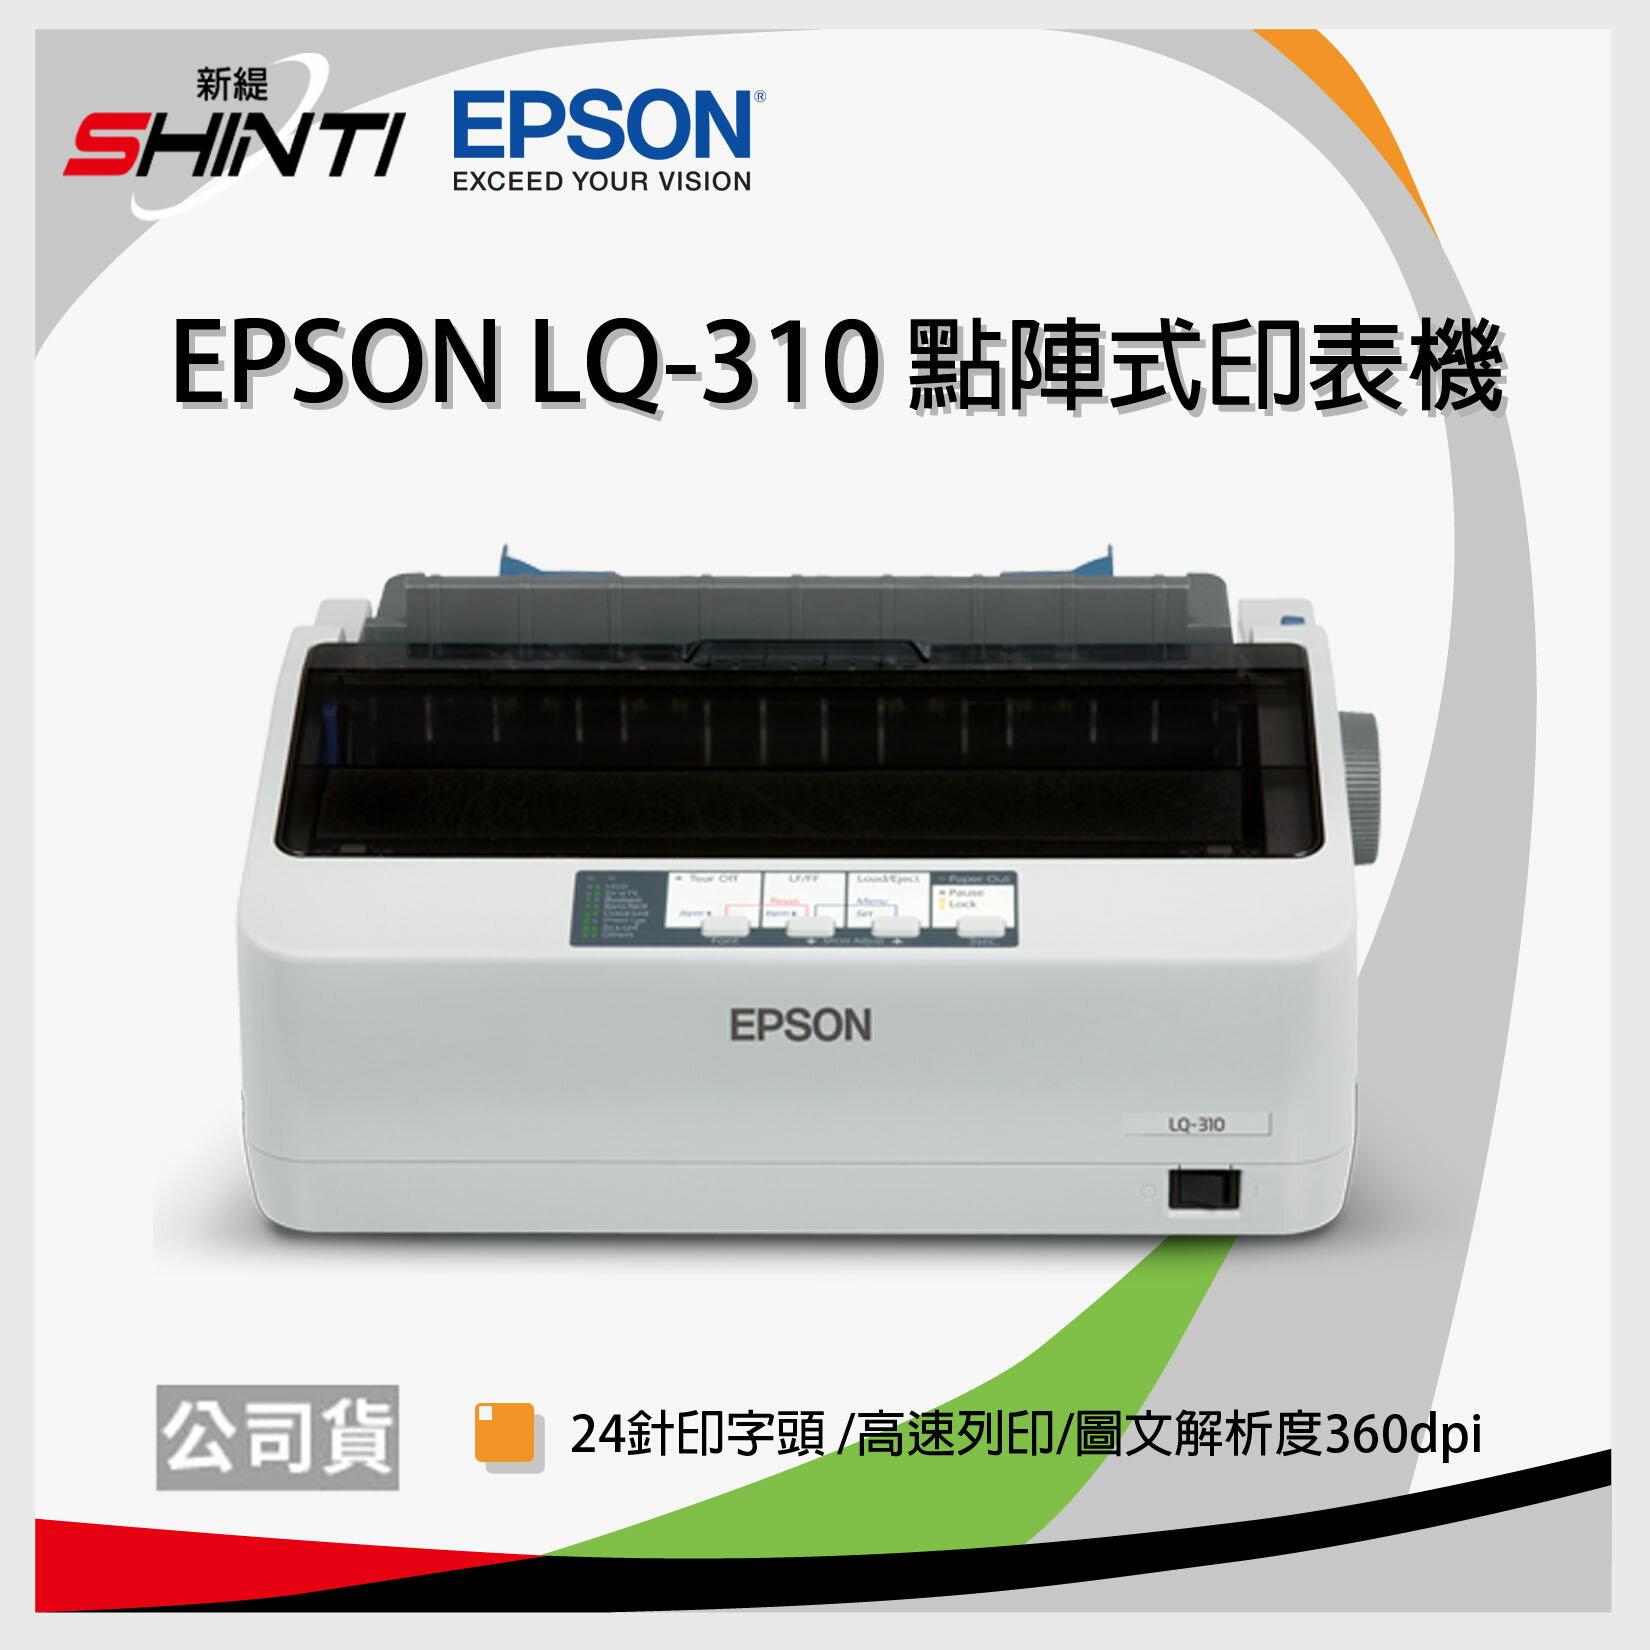 EPSON LQ-310 24針 點矩陣印表機